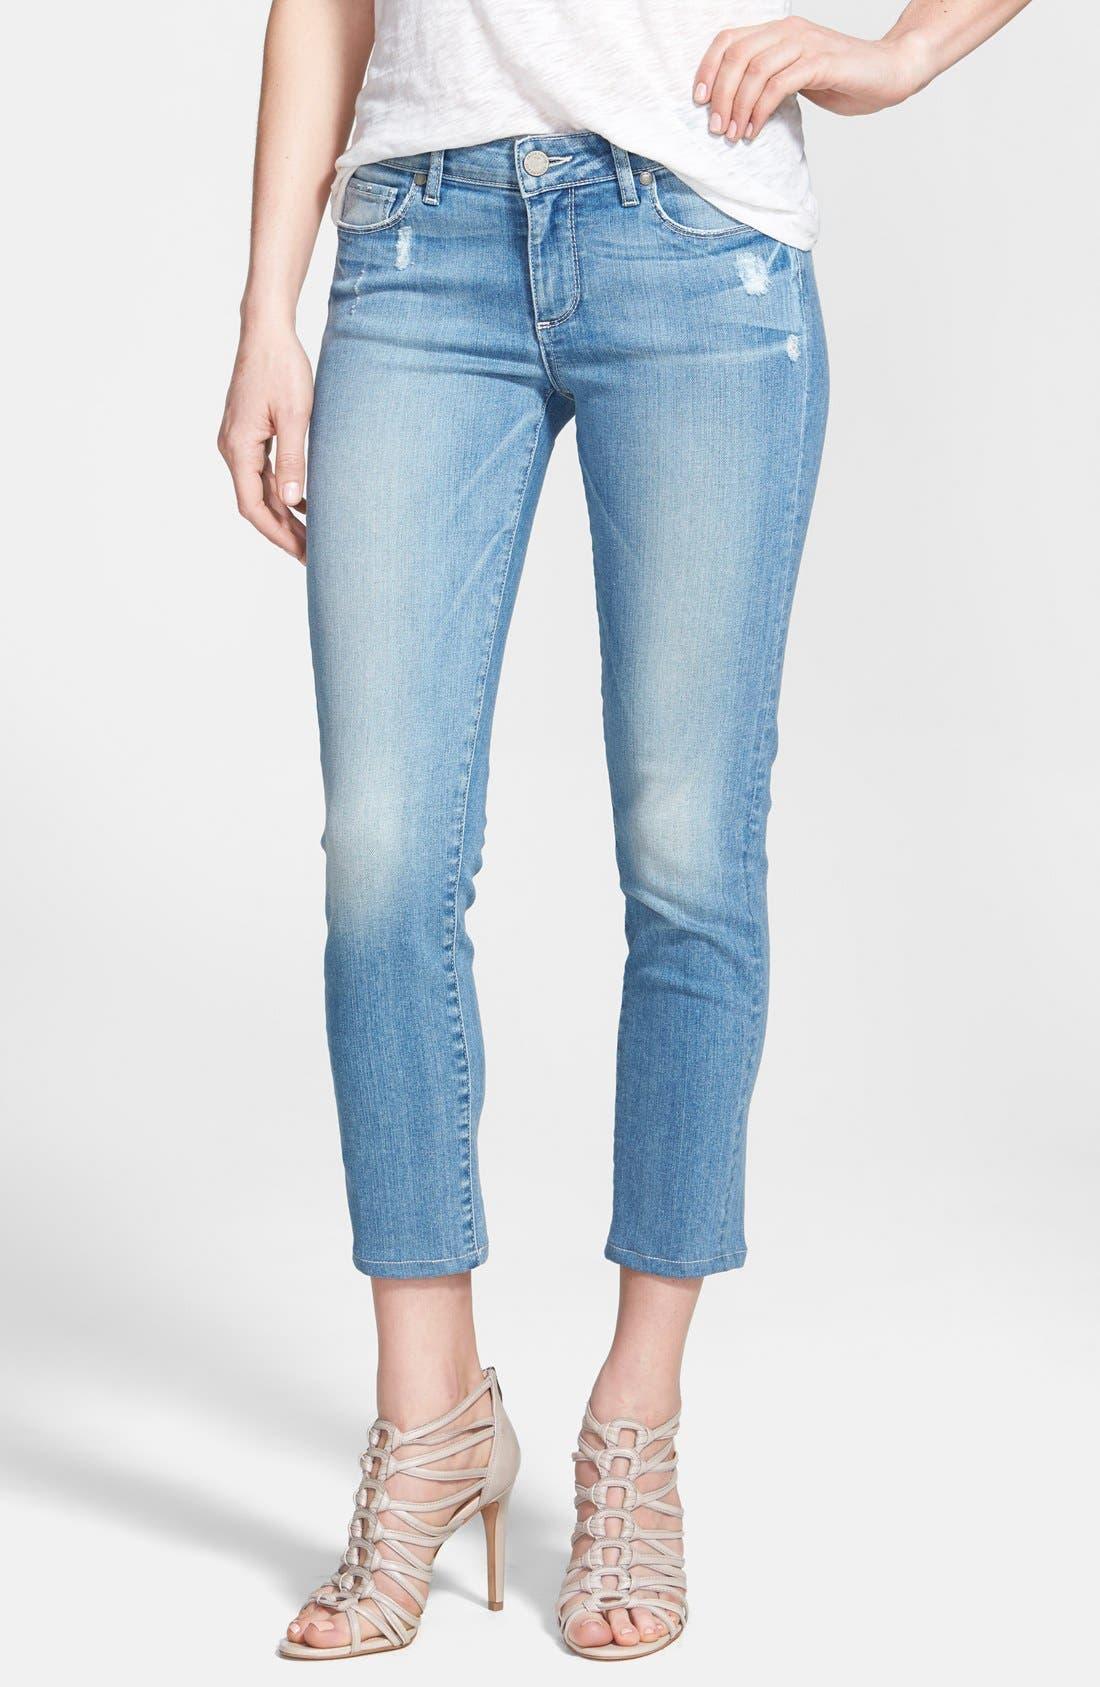 Alternate Image 1 Selected - Paige Denim 'Kylie' Crop Skinny Jeans (Whitley)